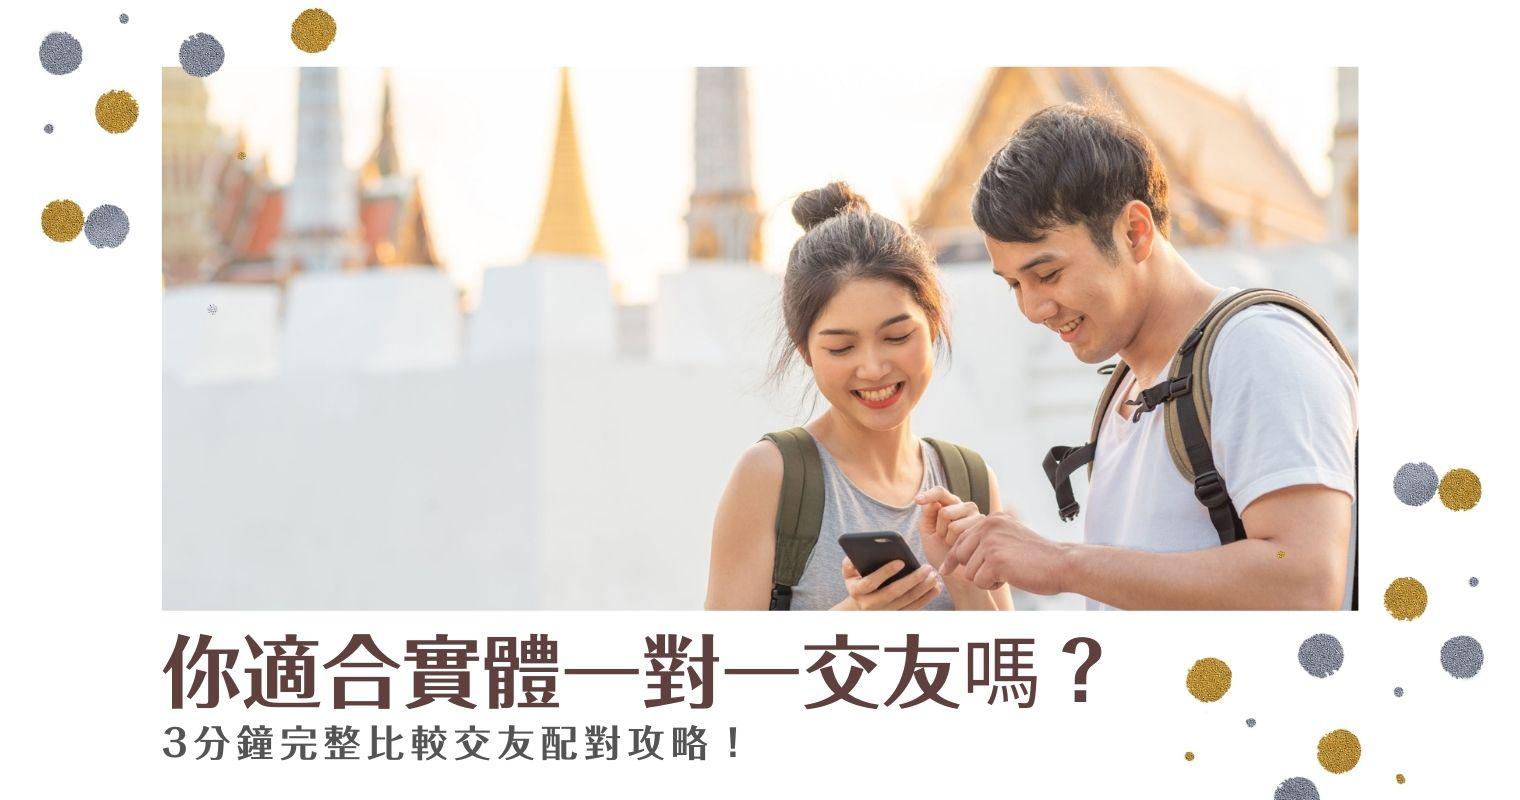 【Together】樂交友|為什麼實體交友成功率那麼高?